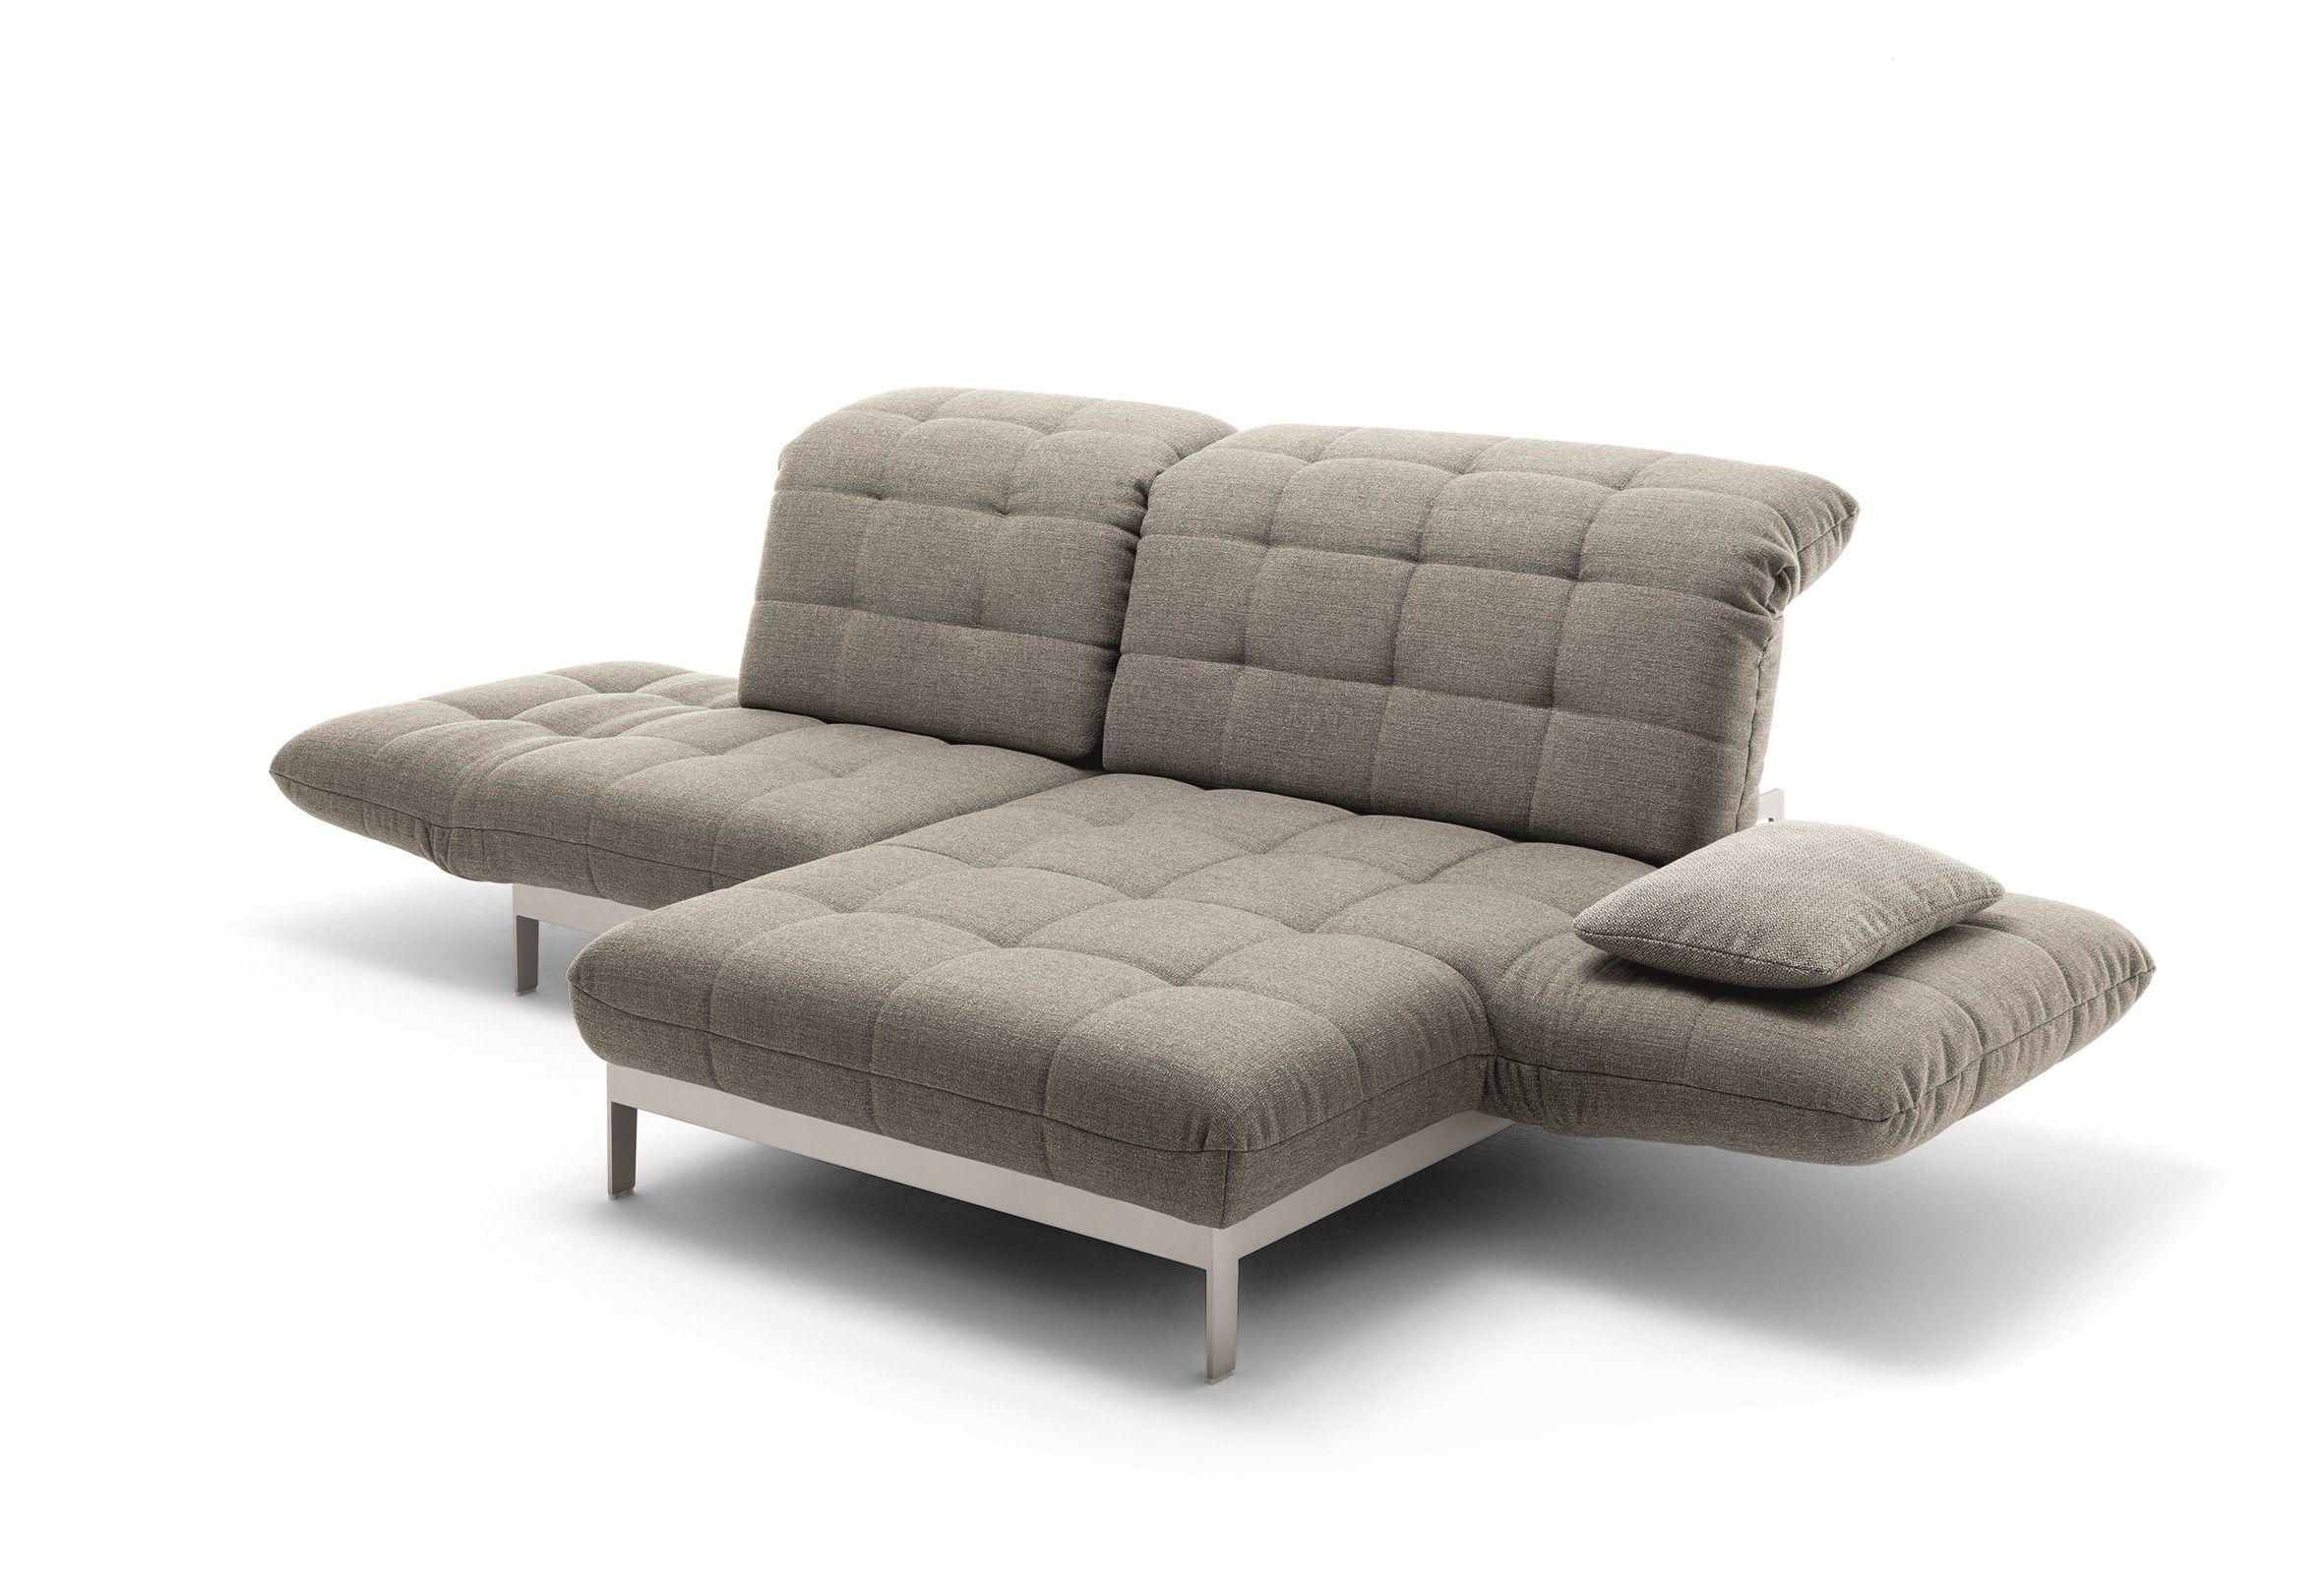 Agio Divano Con Chaise Longue By Rolf Benz Design Norbert Beck